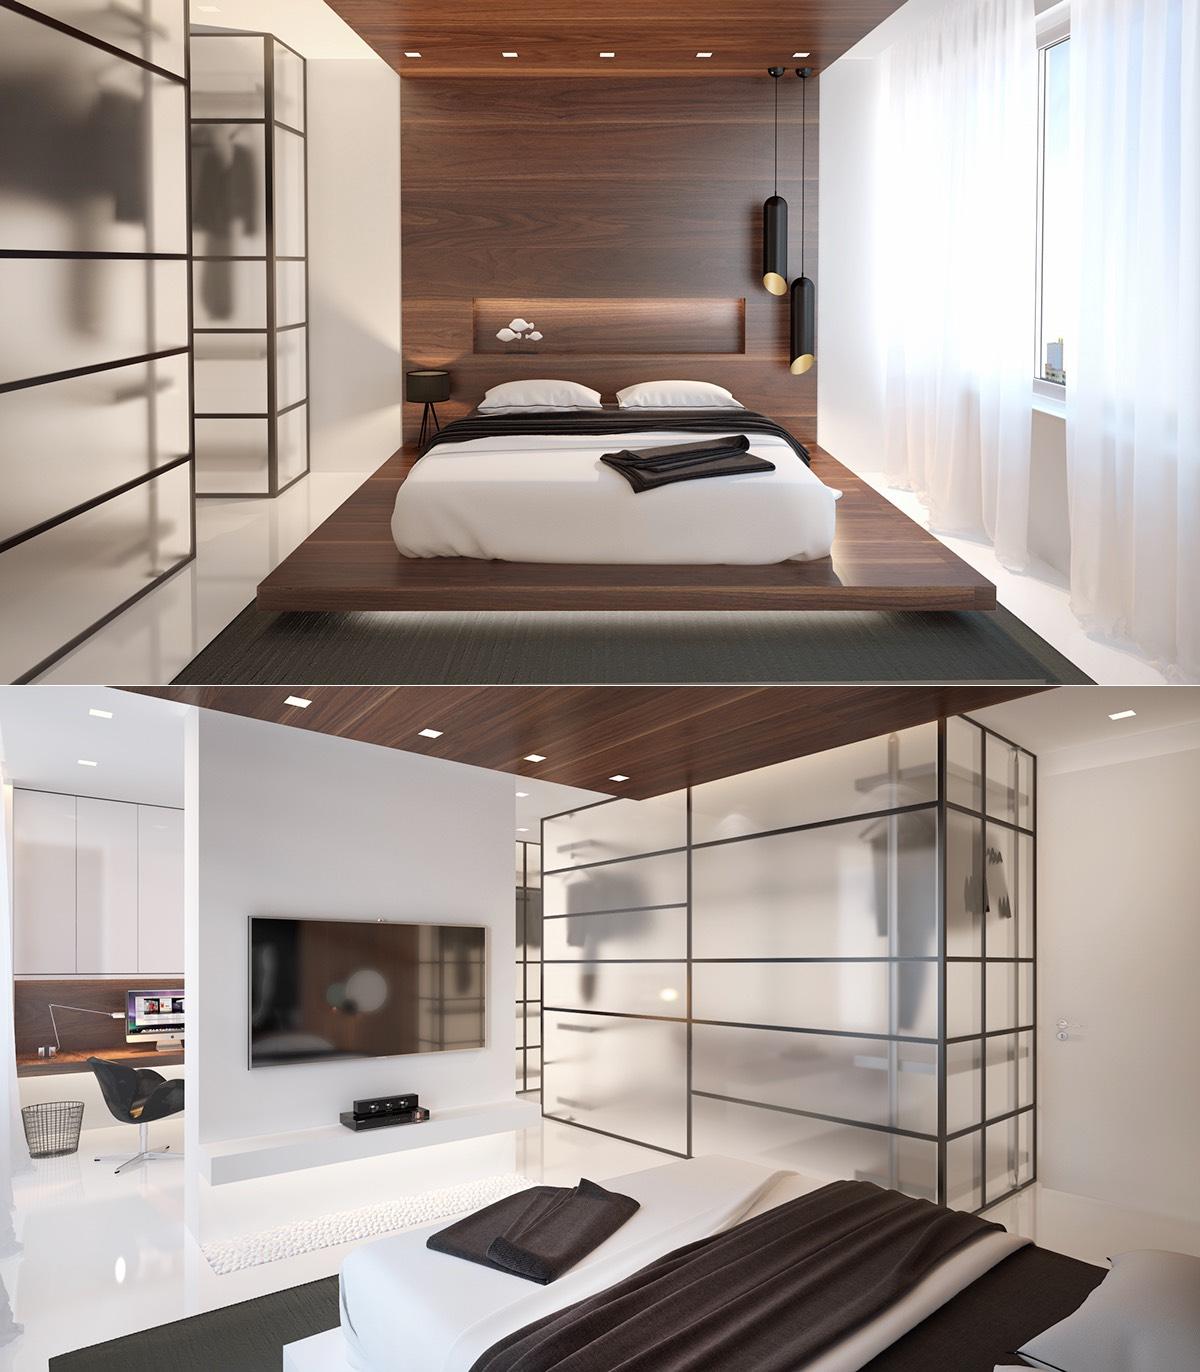 Elegant Bedroom Designs: 15 Luxury Bedroom Design With Elegant Wardrobe